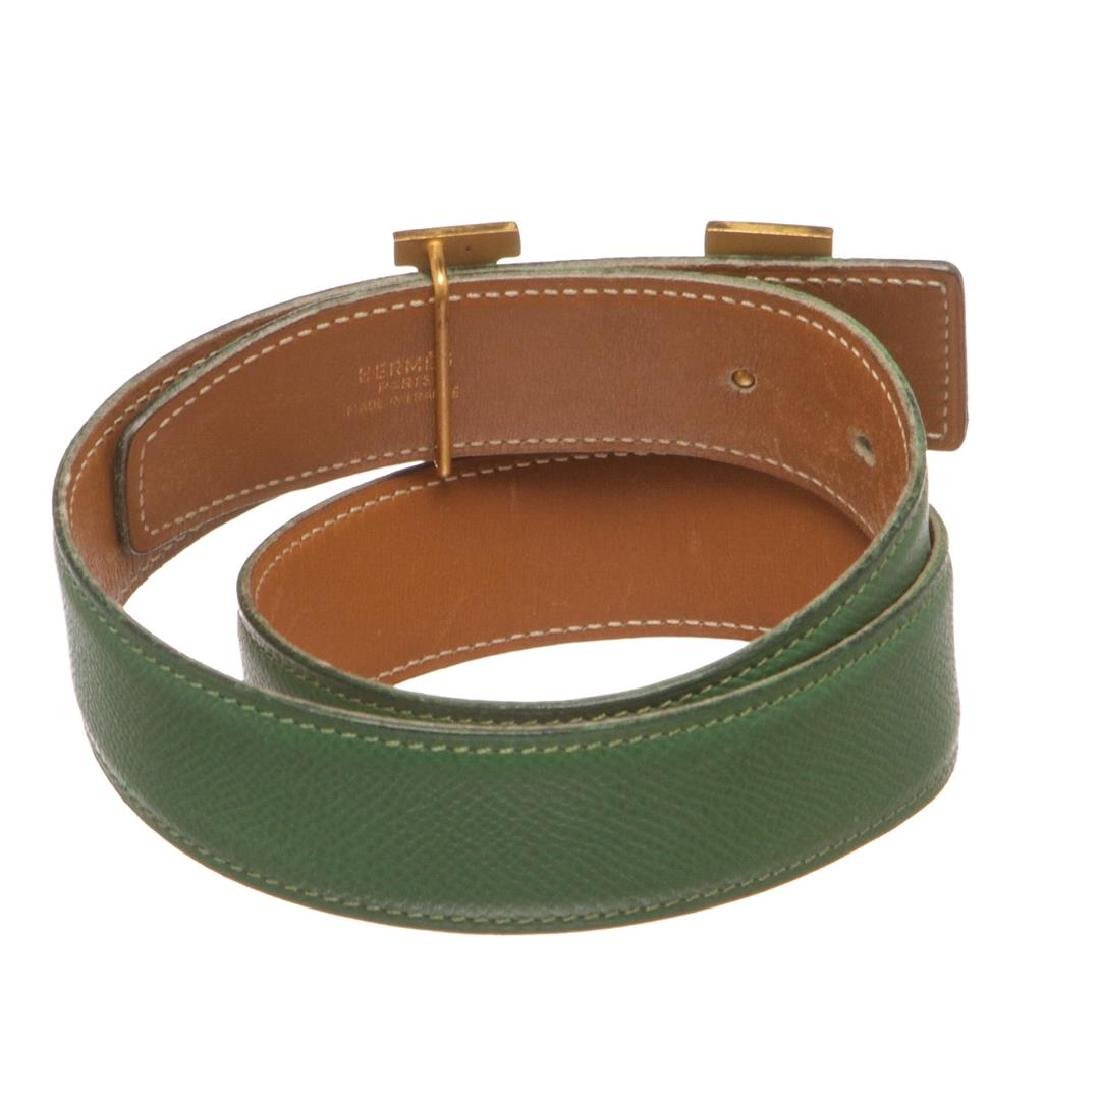 Hermes Green Leather Reversible Constance H Belt 60 - 5